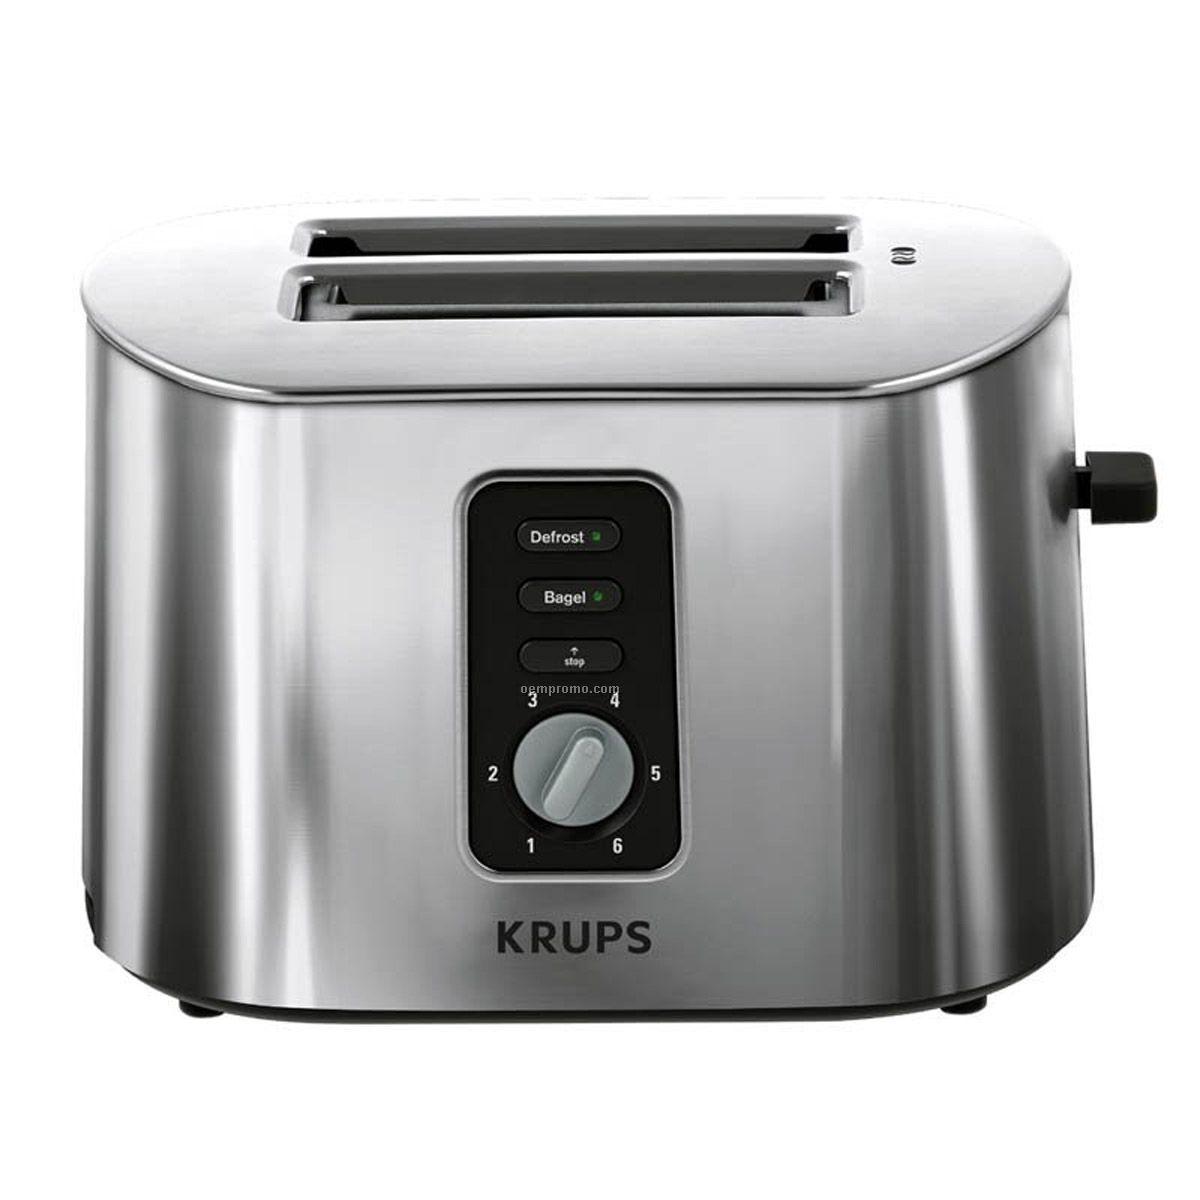 Krups 2-slice Metal Toaster (Stainless)